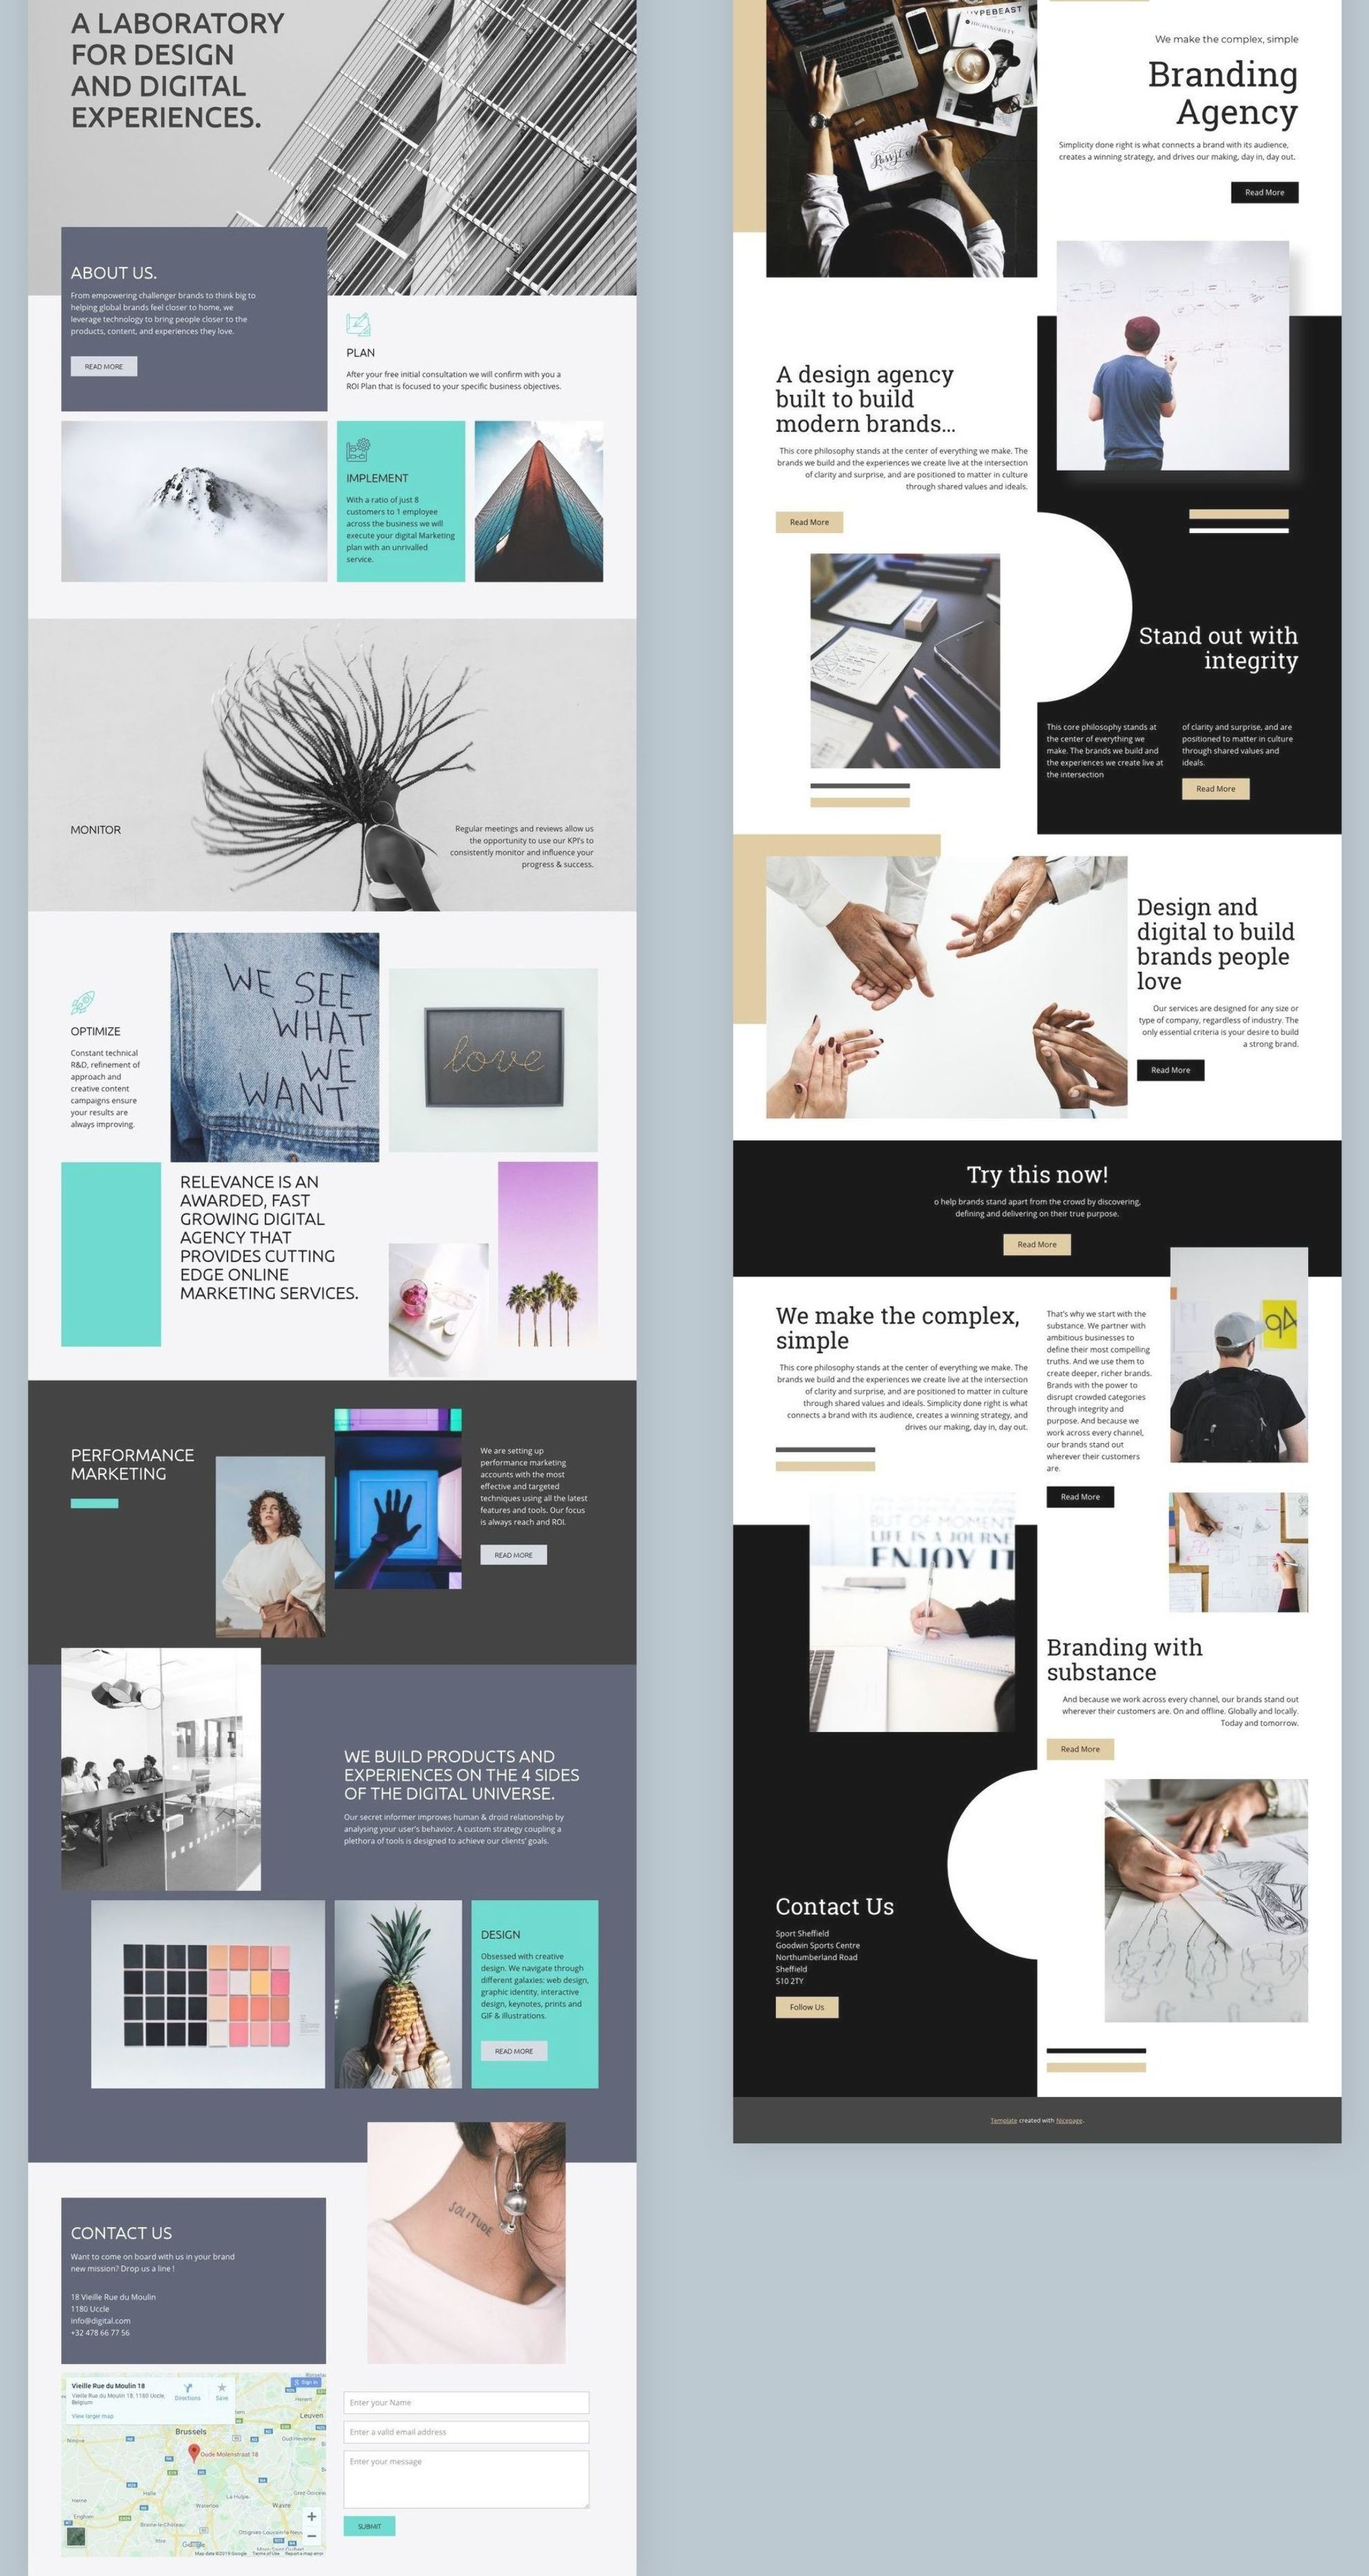 Pin By Glenn Jenner On Corporate Re Design In 2020 Corporate Website Design Mobile Website Design Diy Website Design